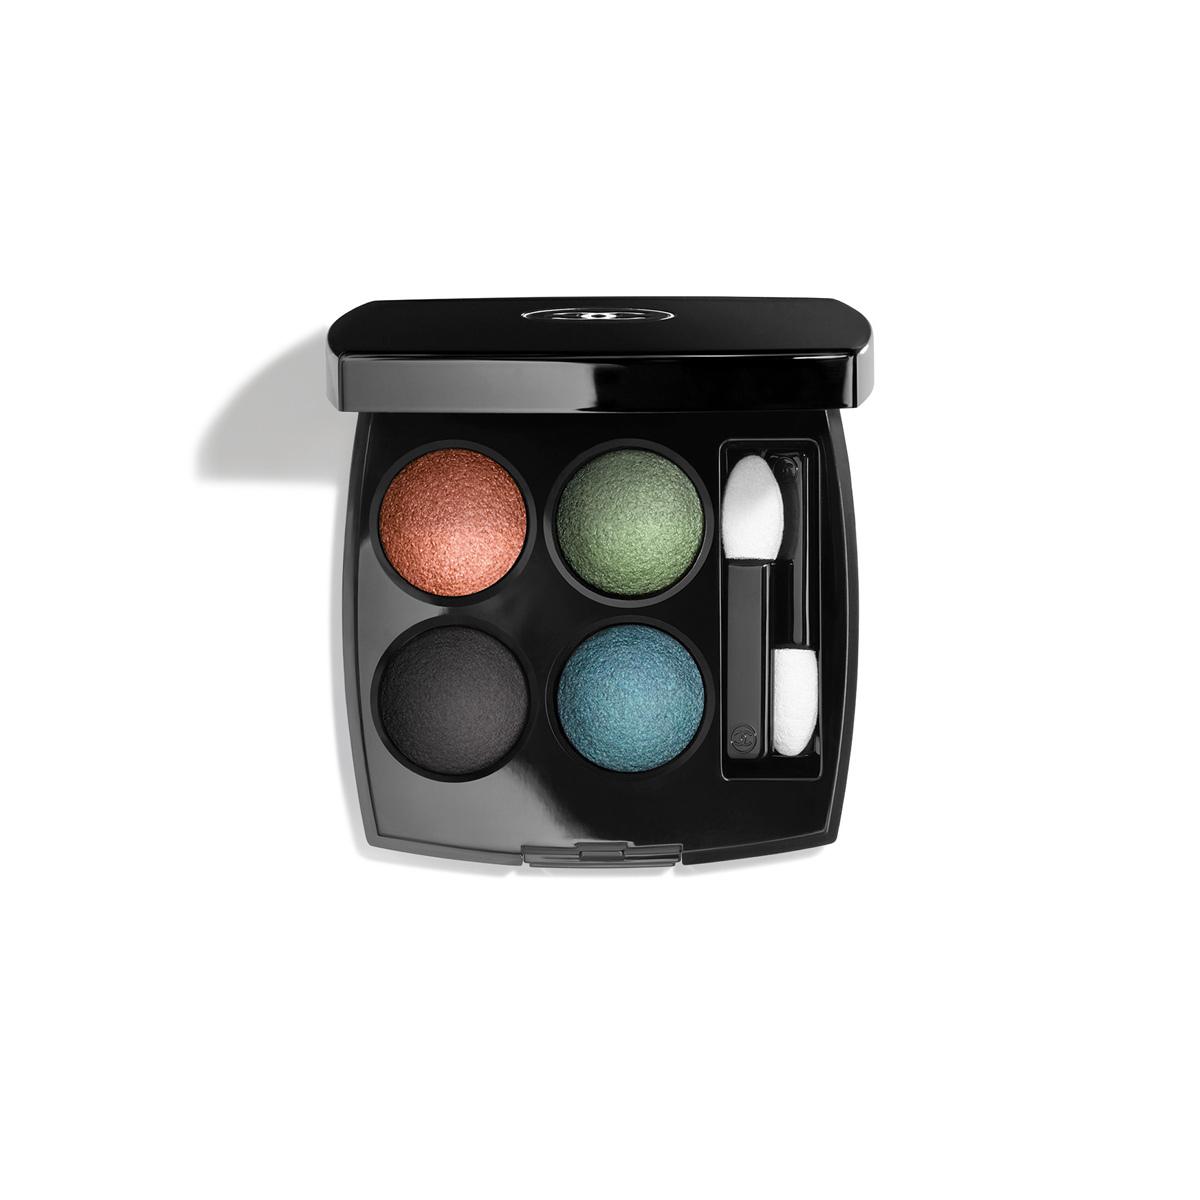 Paleta de sombras de ojos Splendeur et Audace, de Chanel (54 euros).